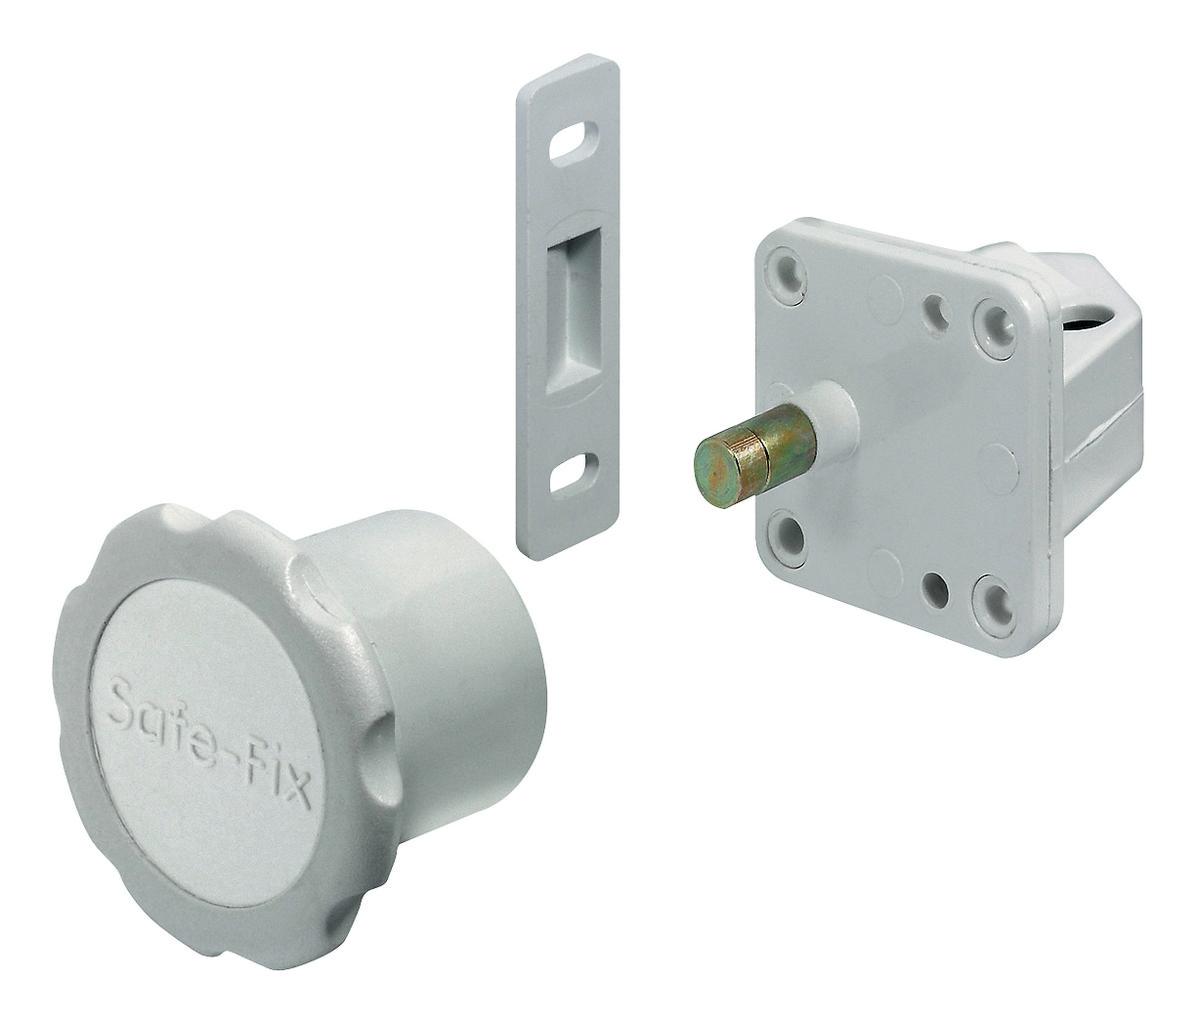 Hafele 245 41 791 Magnetic Door Lock Concealed Plastic